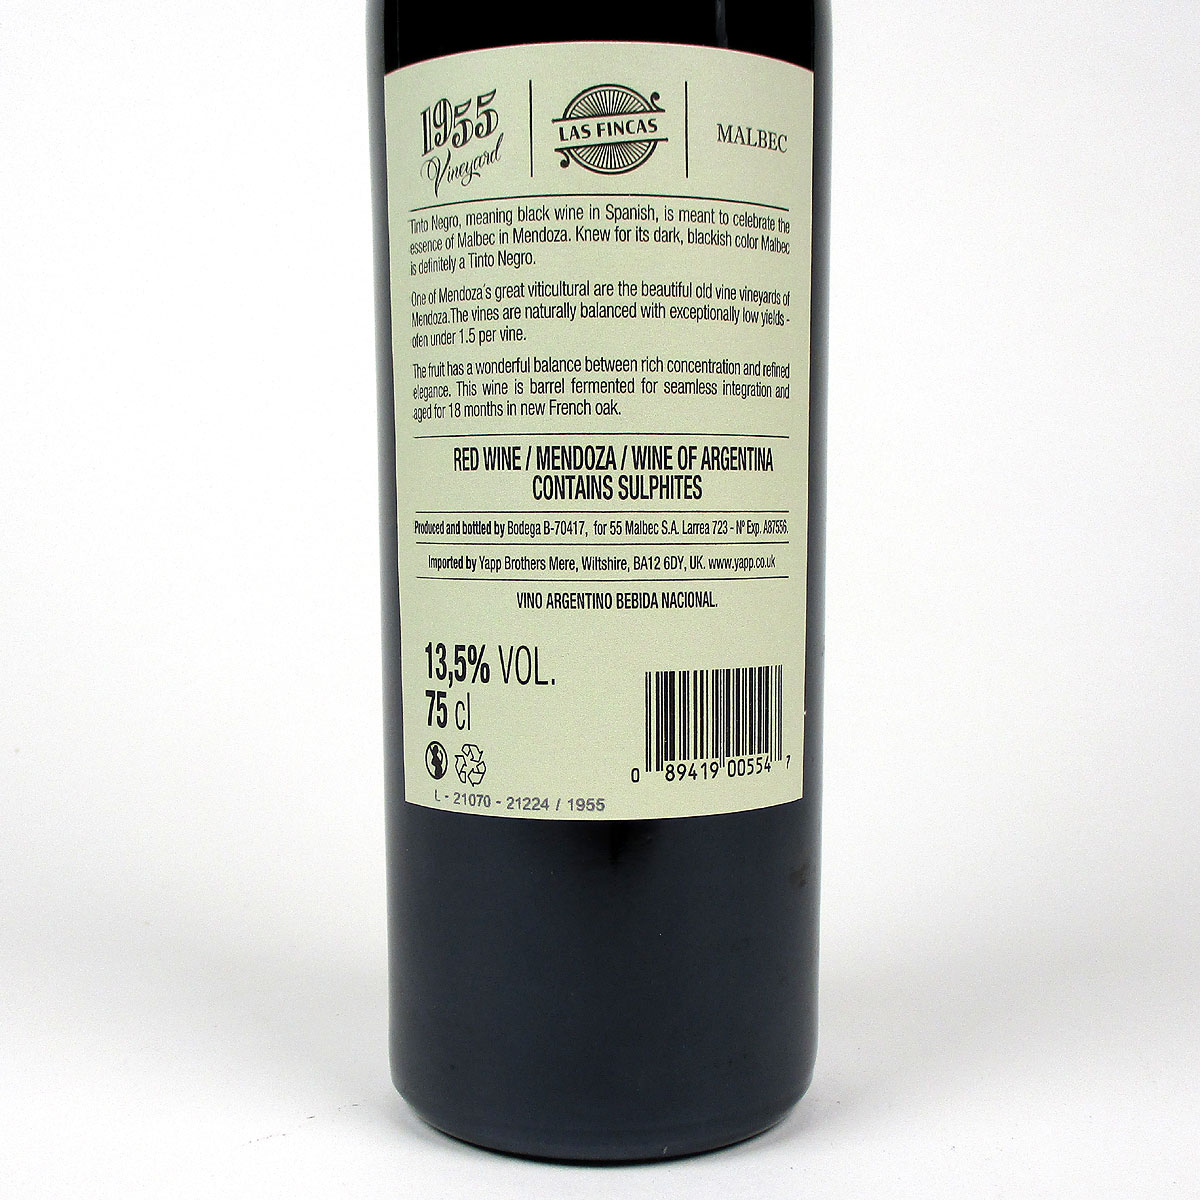 Tinto Negro: Uco Valley Mendoza Malbec 'Vineyard 1955' 2018 - Bottle Rear Label